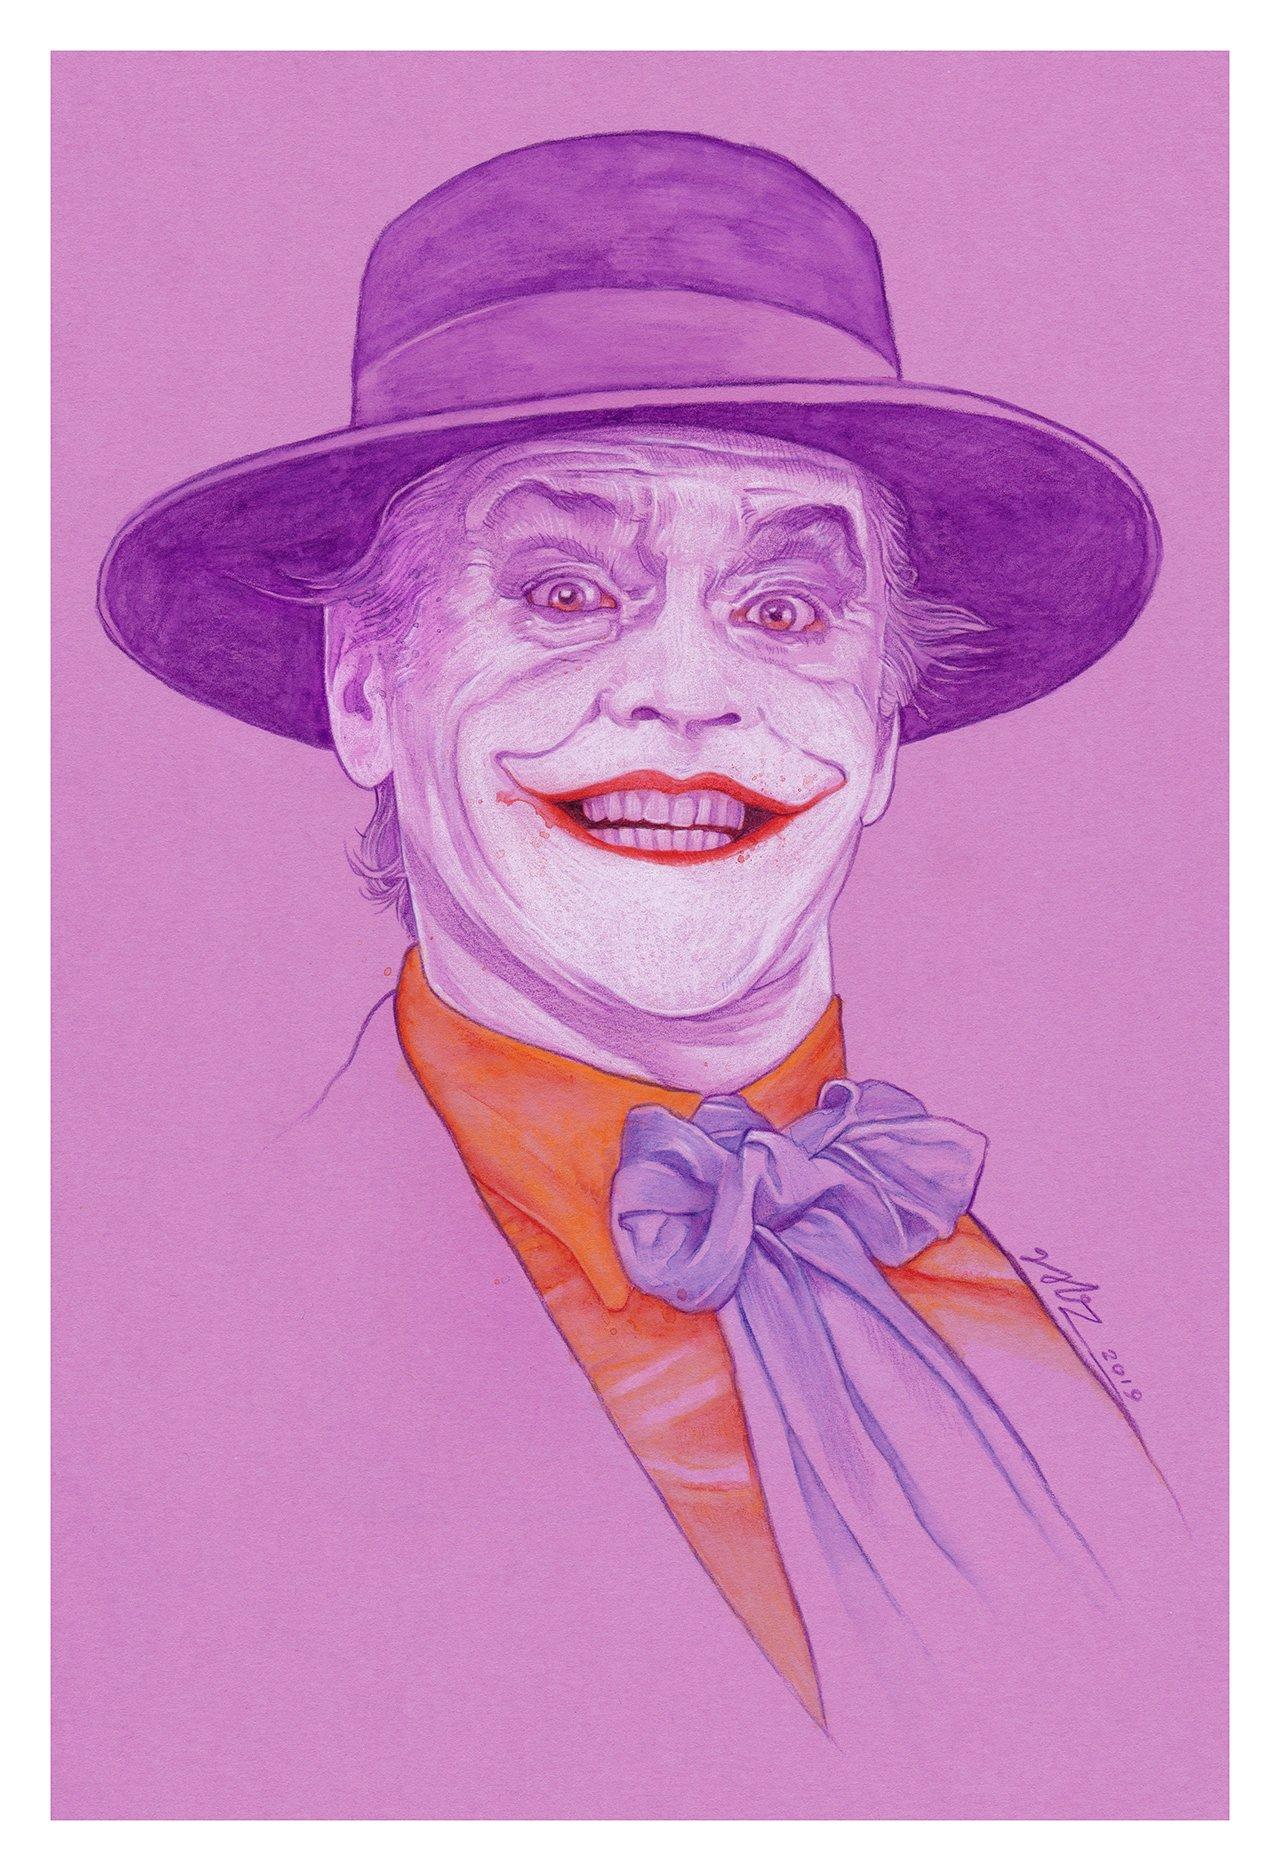 Image of Joker Jack